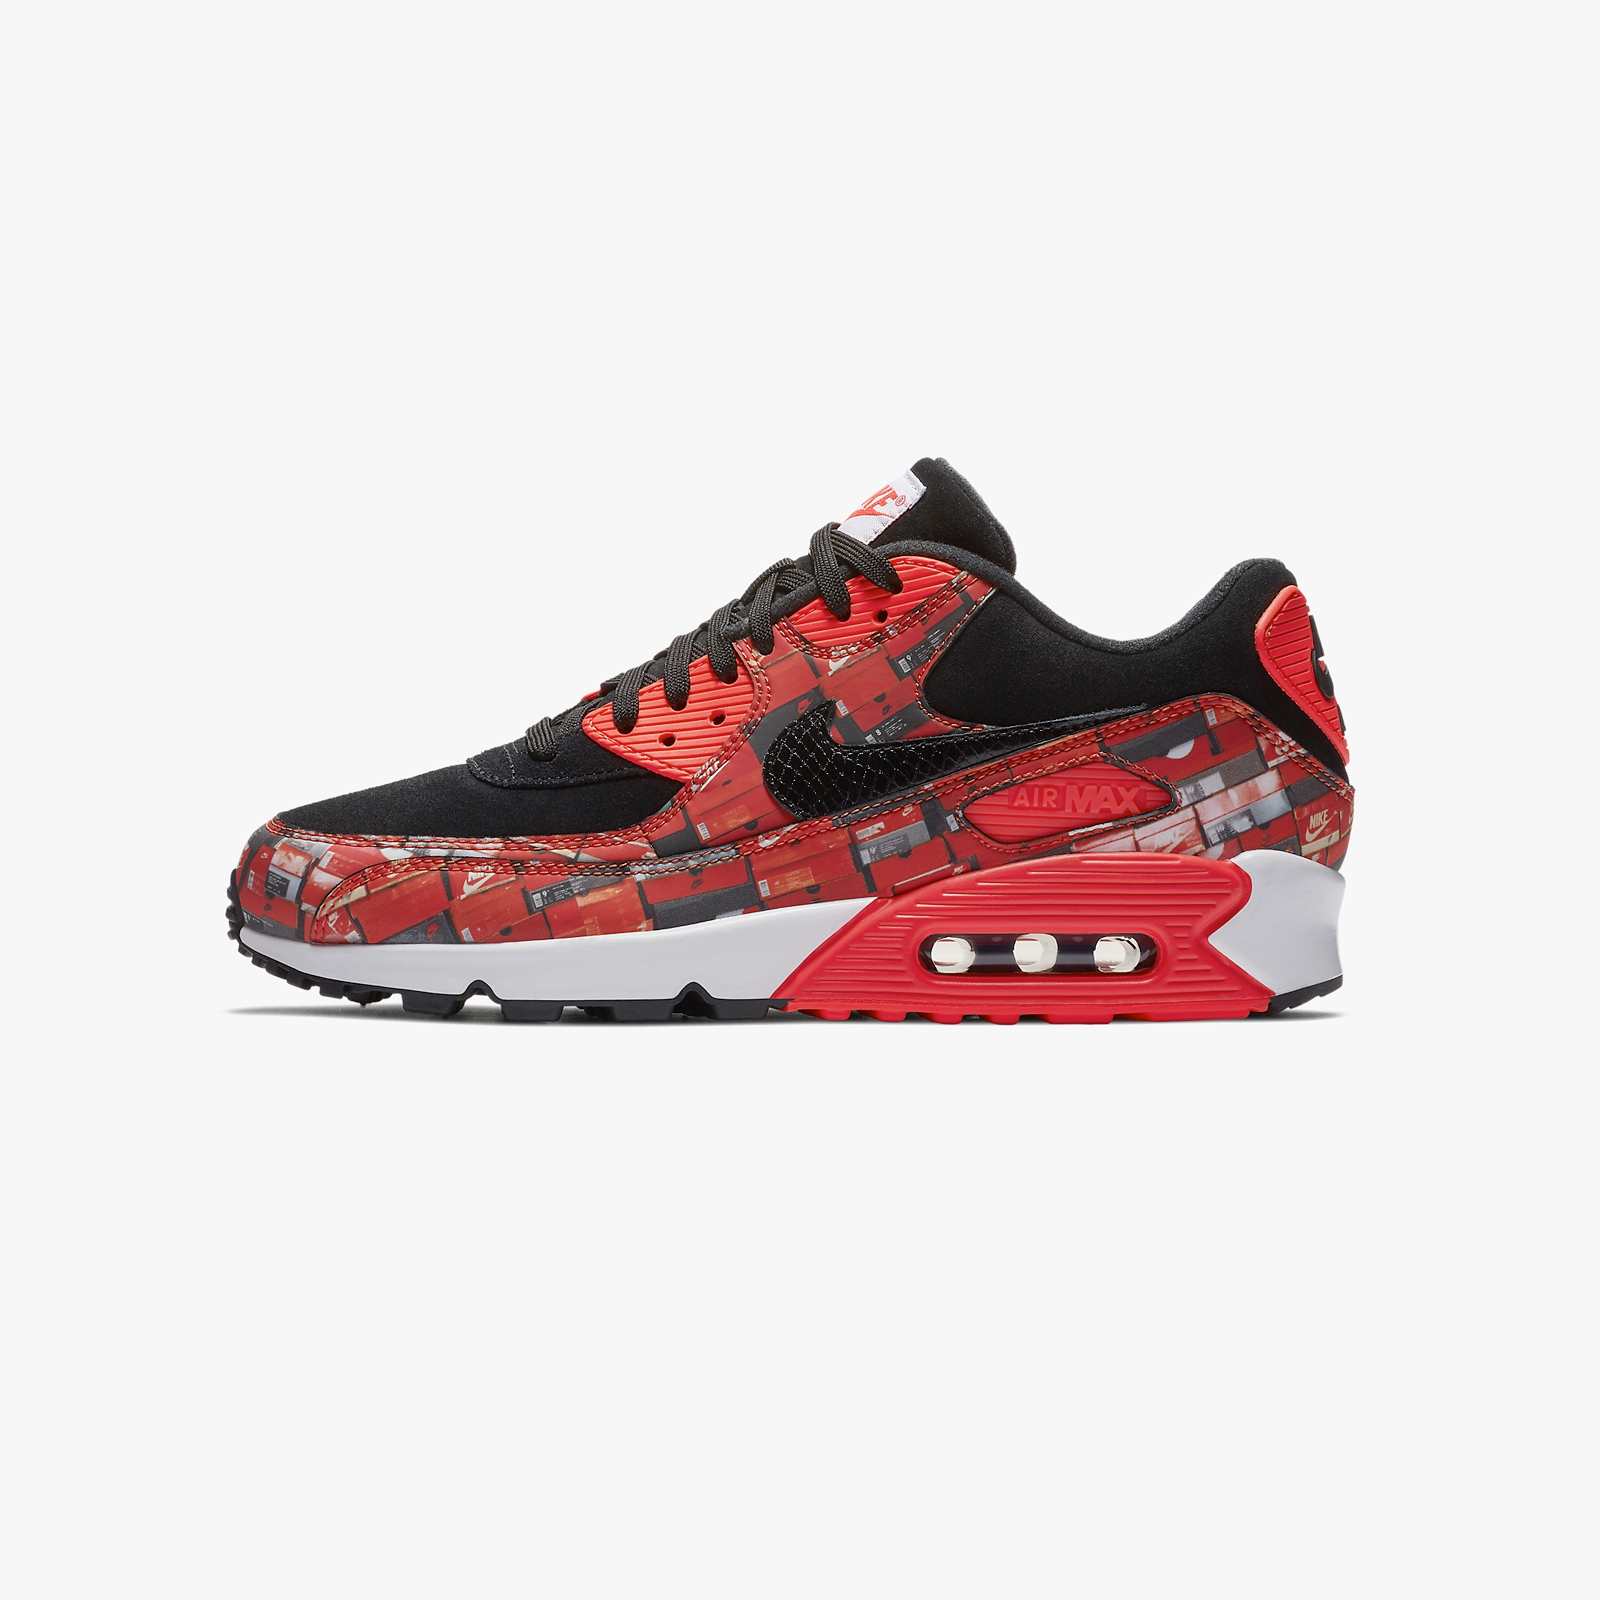 super popular 3113e 8ce8d Nike Air Max 90 Print - Aq0926-001 - Sneakersnstuff   sneakers   streetwear  online since 1999